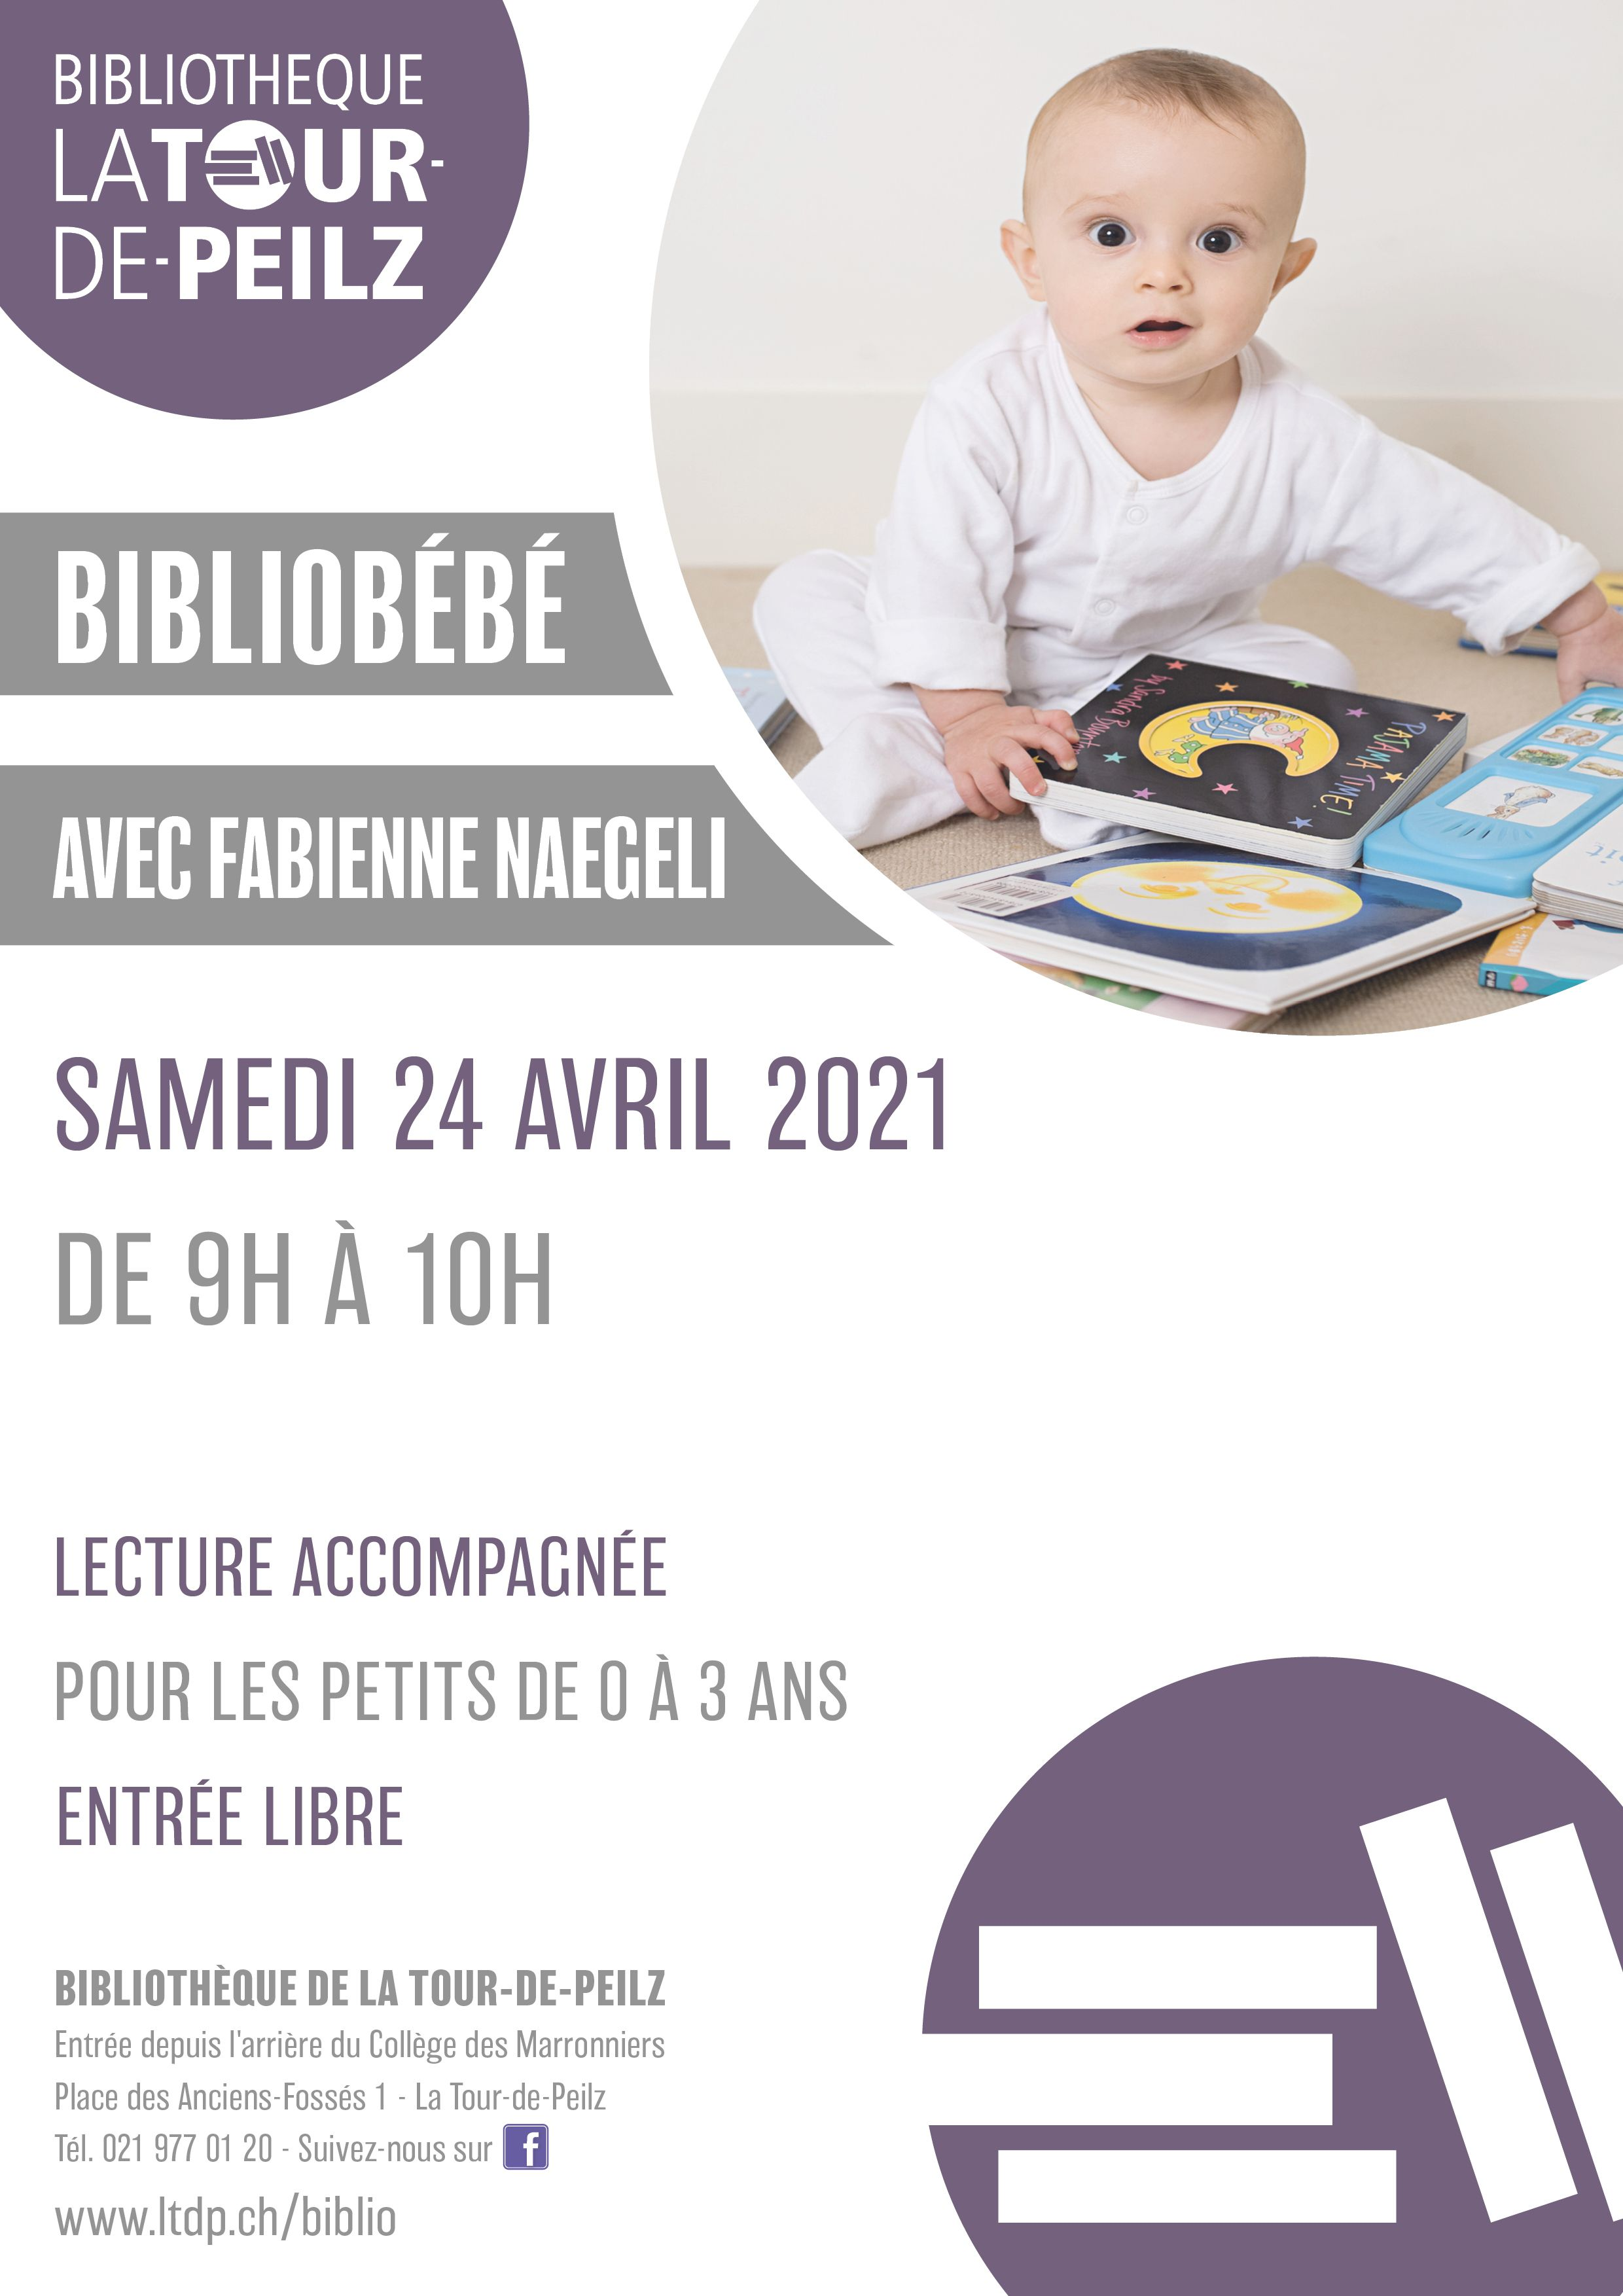 Bibliobébé avec Fabienne Naegeli